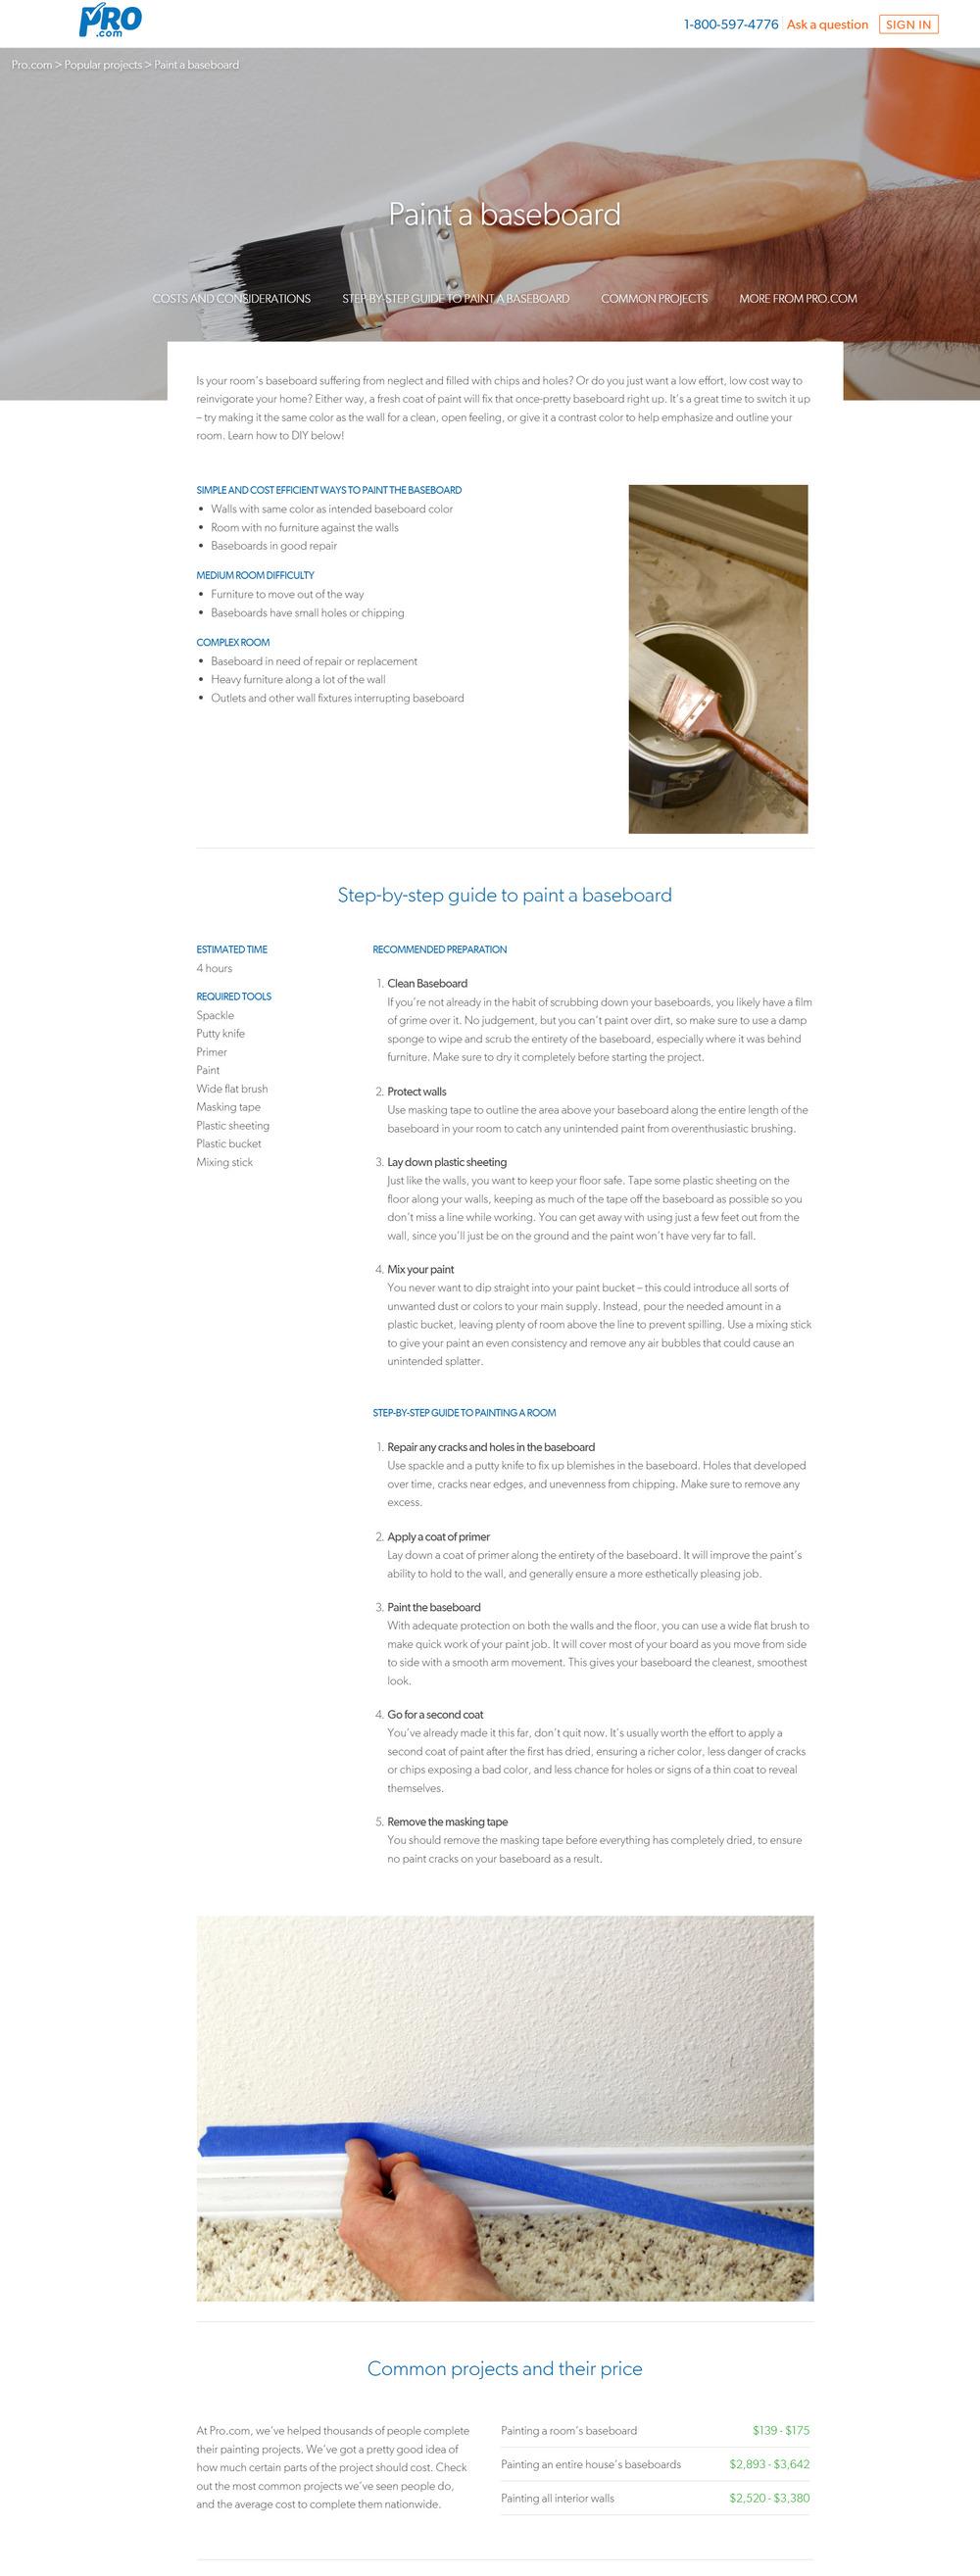 Pro.com paint baseboard.jpg